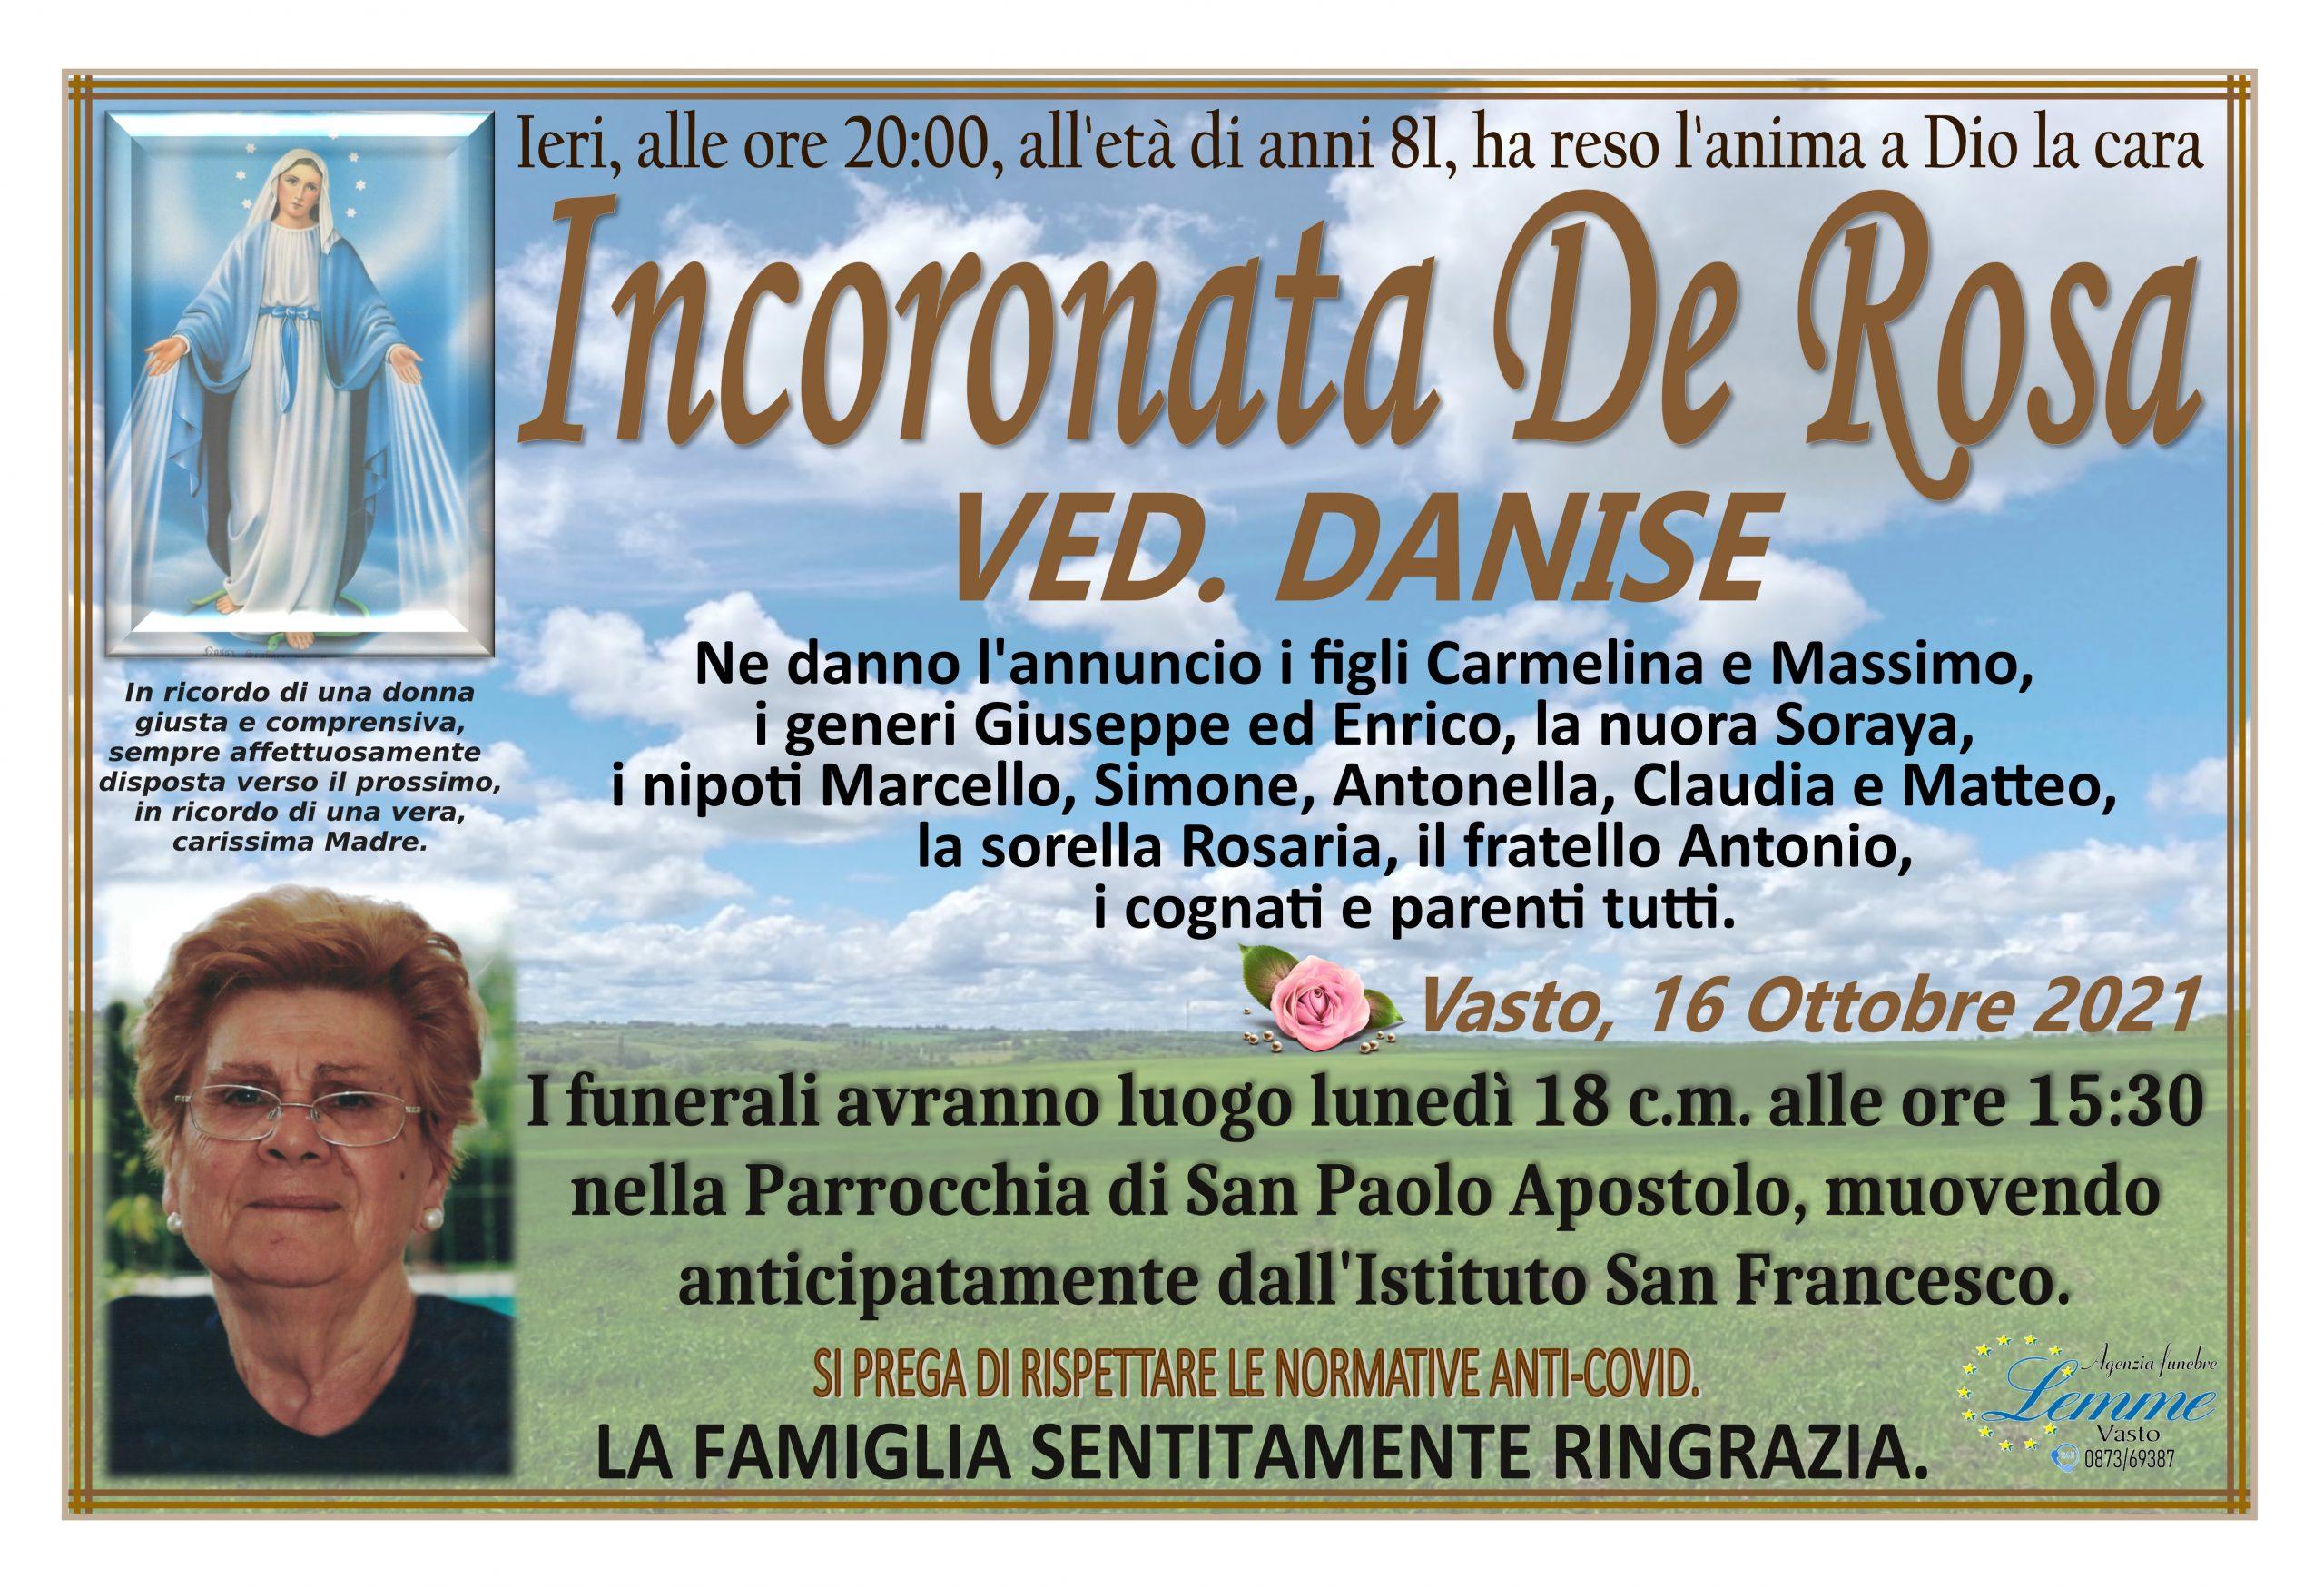 INCORONATA DE ROSA